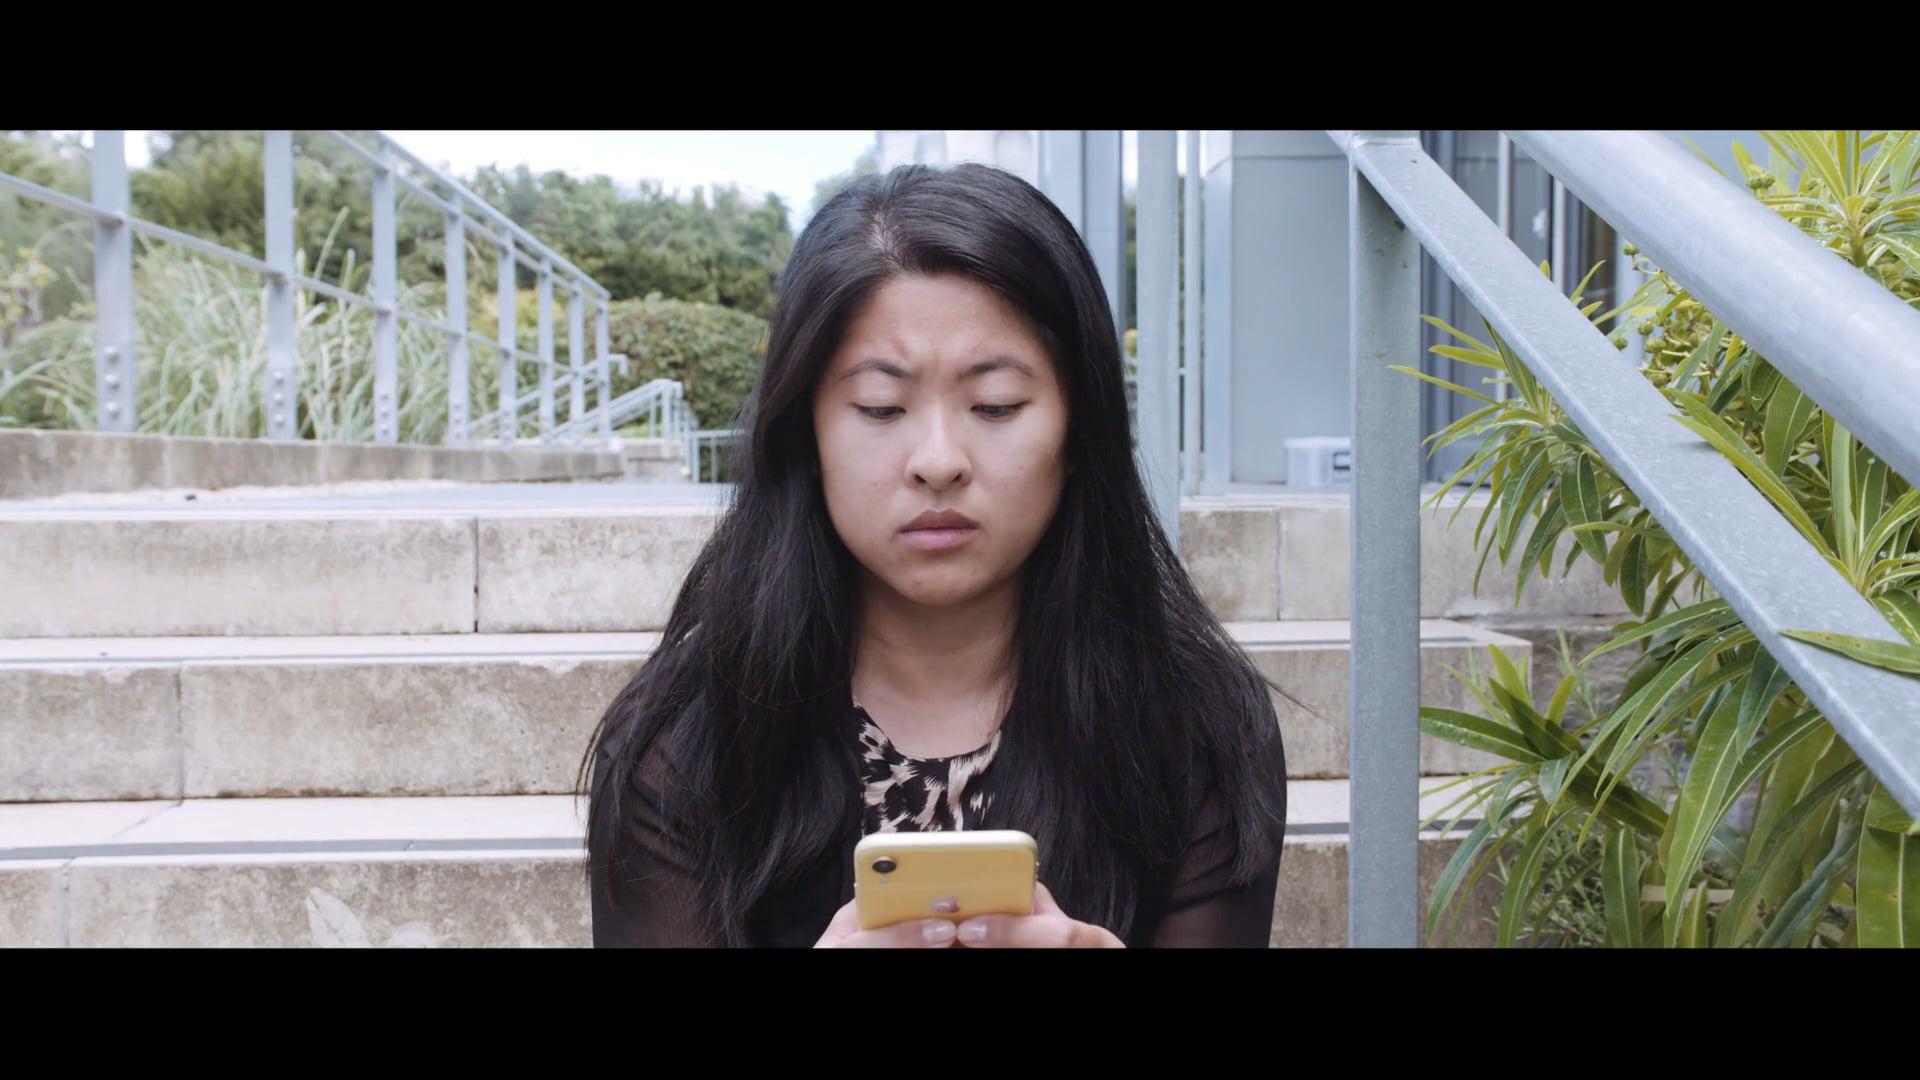 The Newsroom - Christine Fang as MacKenzie McHale